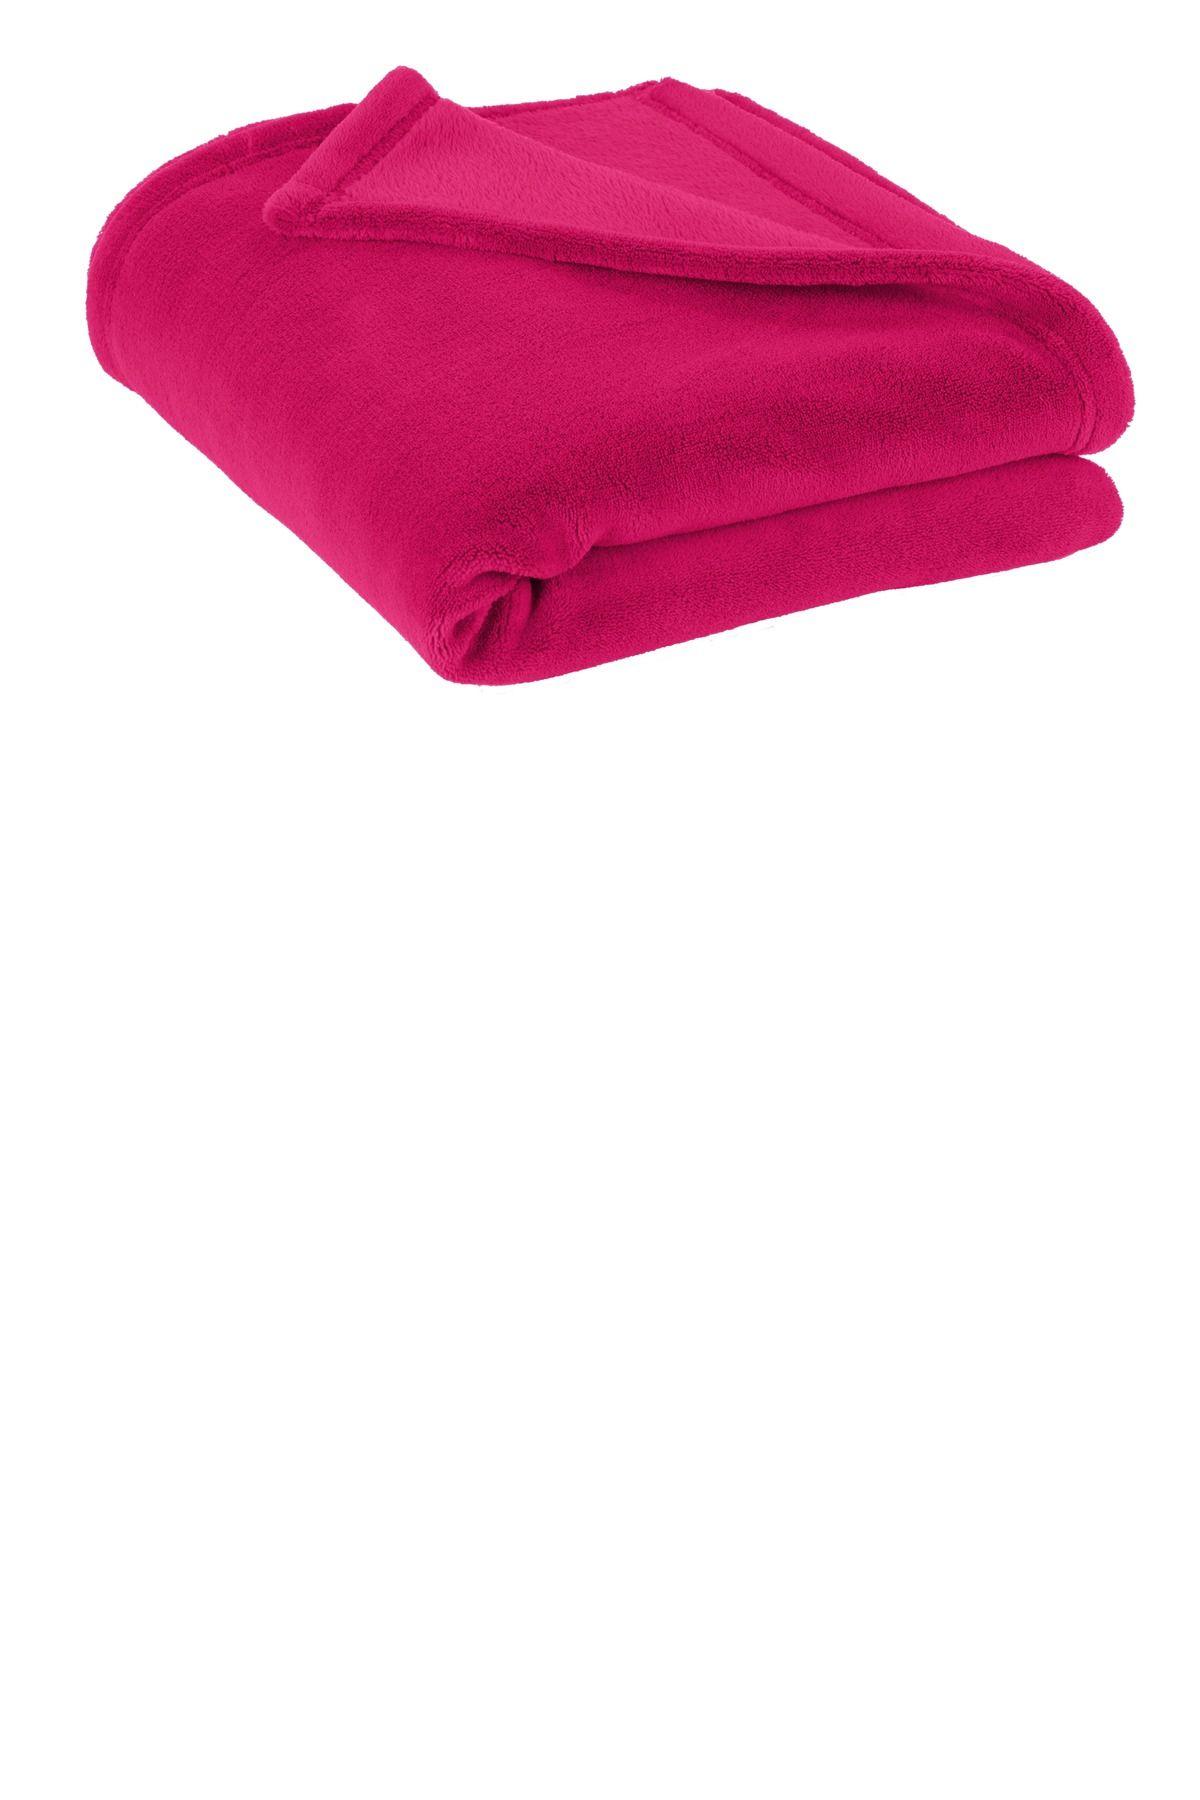 academy pl colorado. Blanket clipart plush